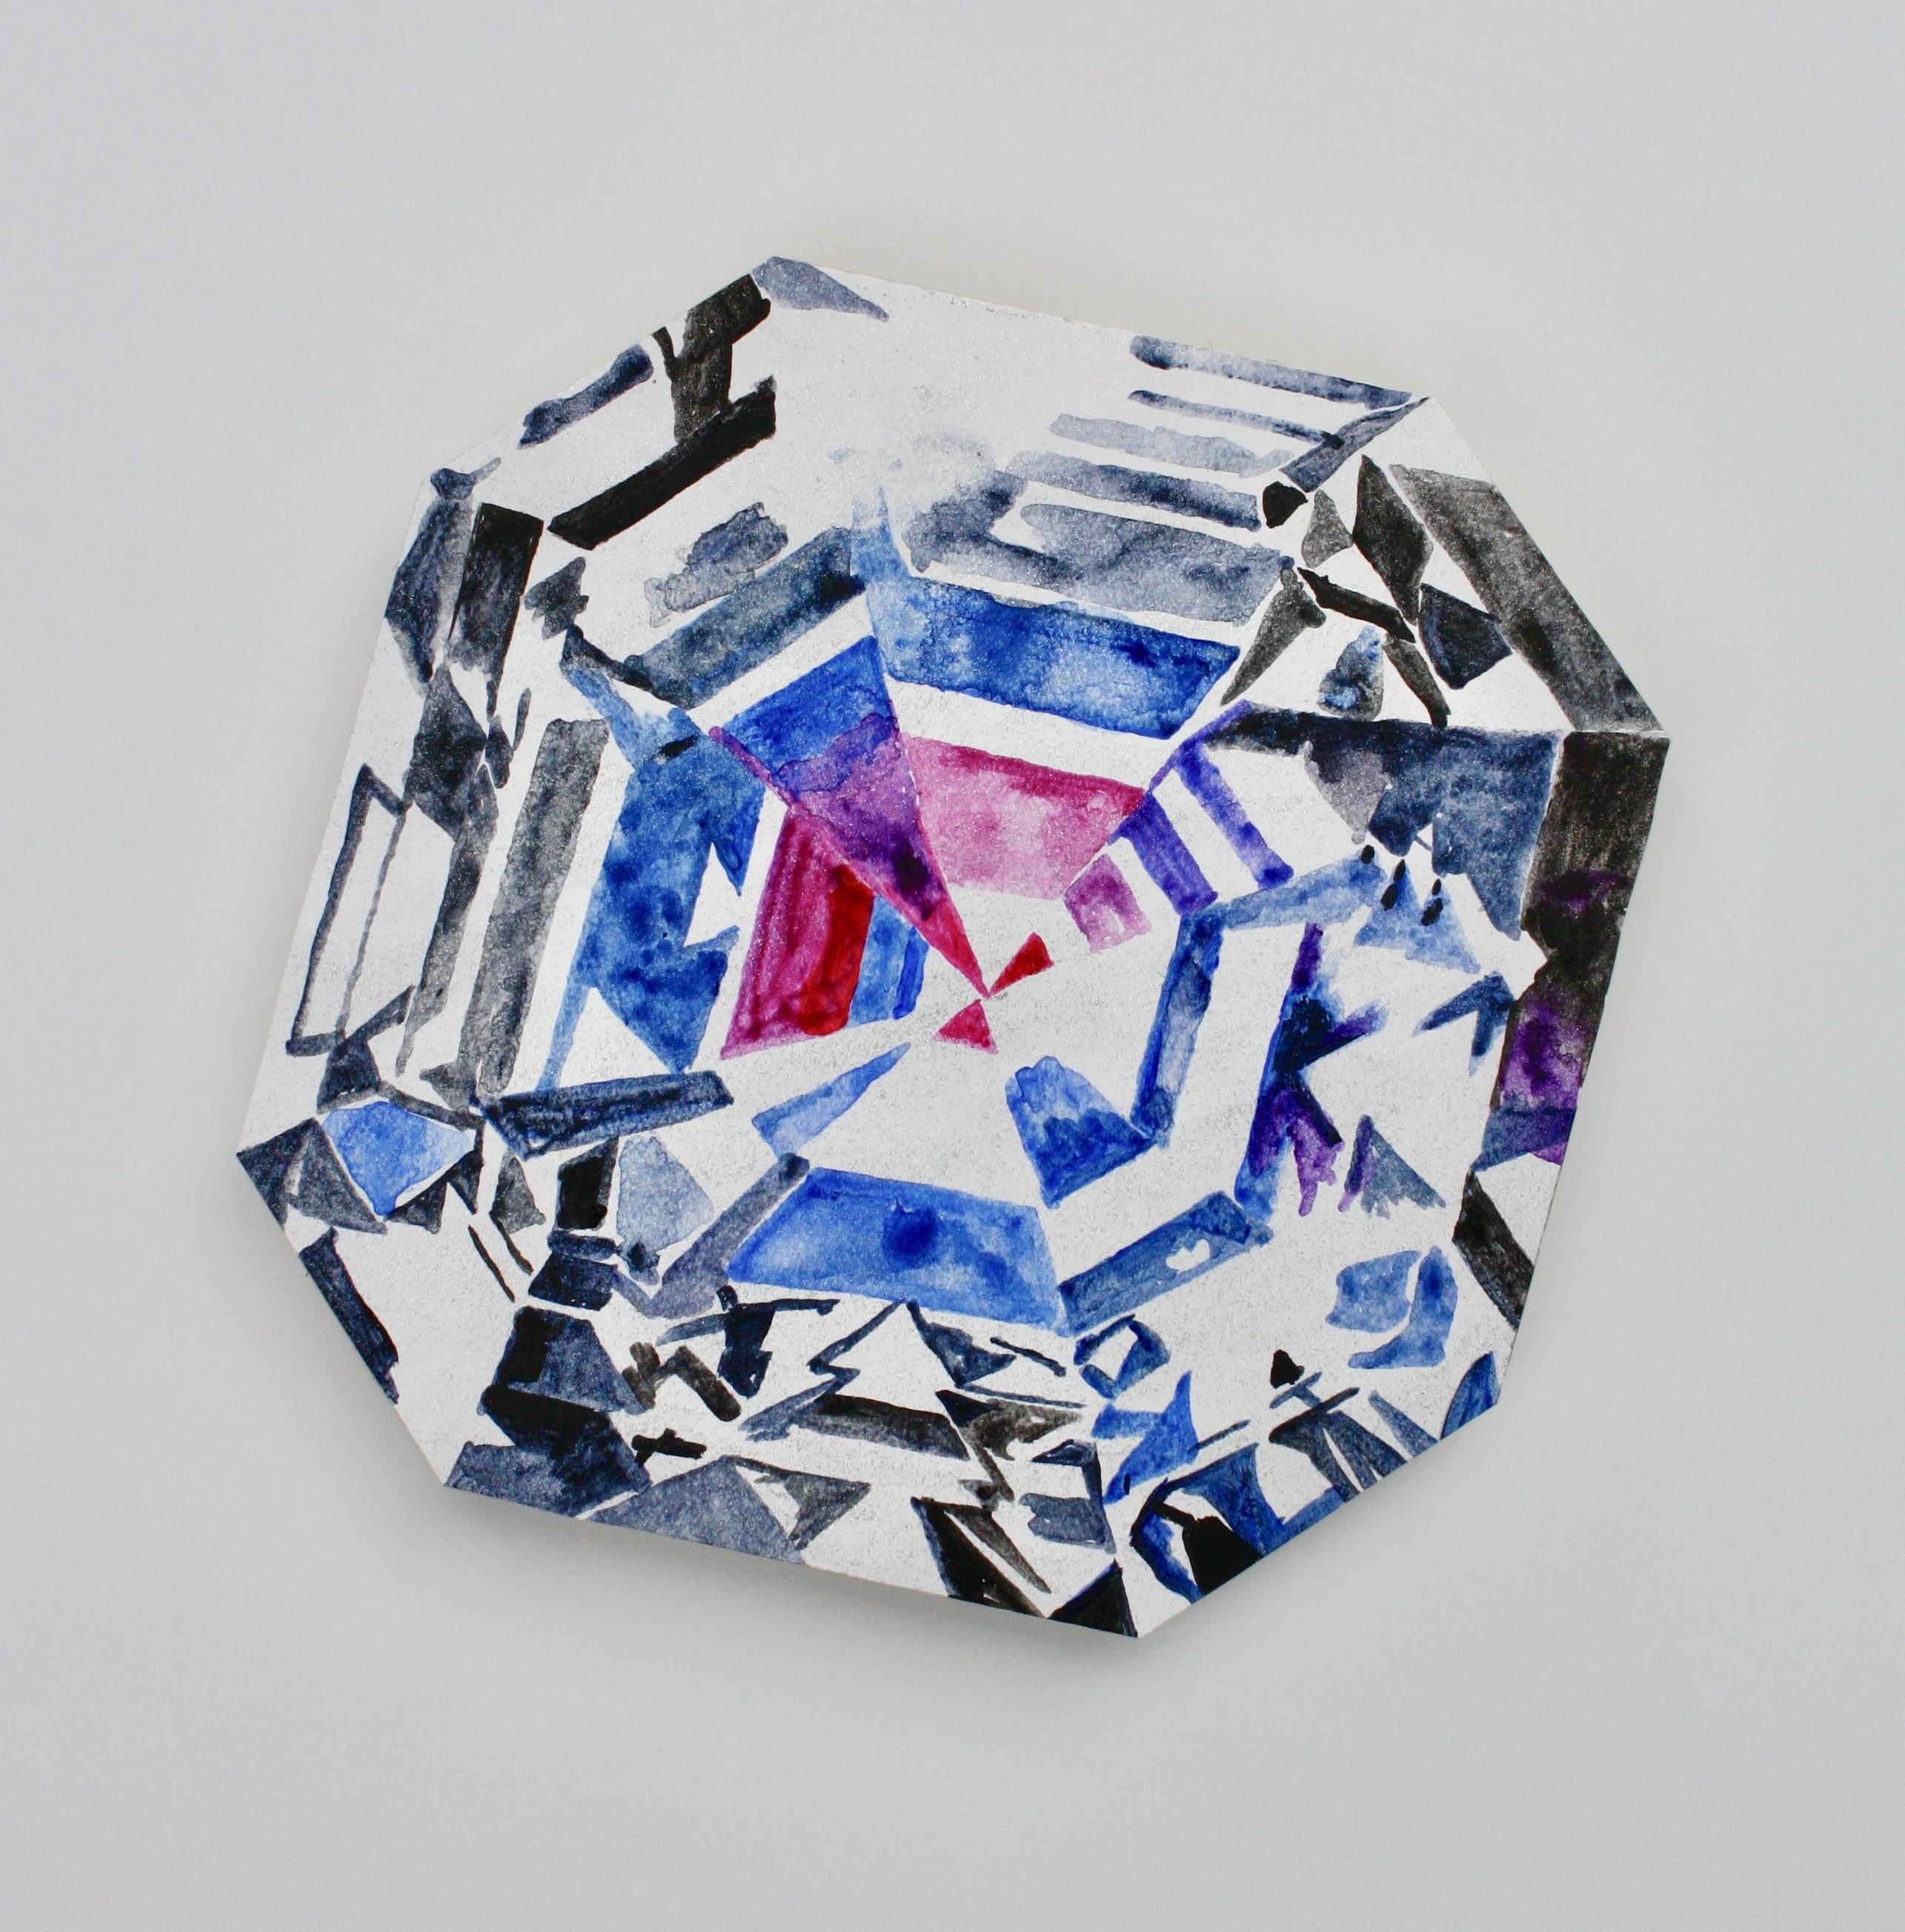 Jyothi asscher cut diamond acrylic and diamond dust on plexiglas zcnxxh